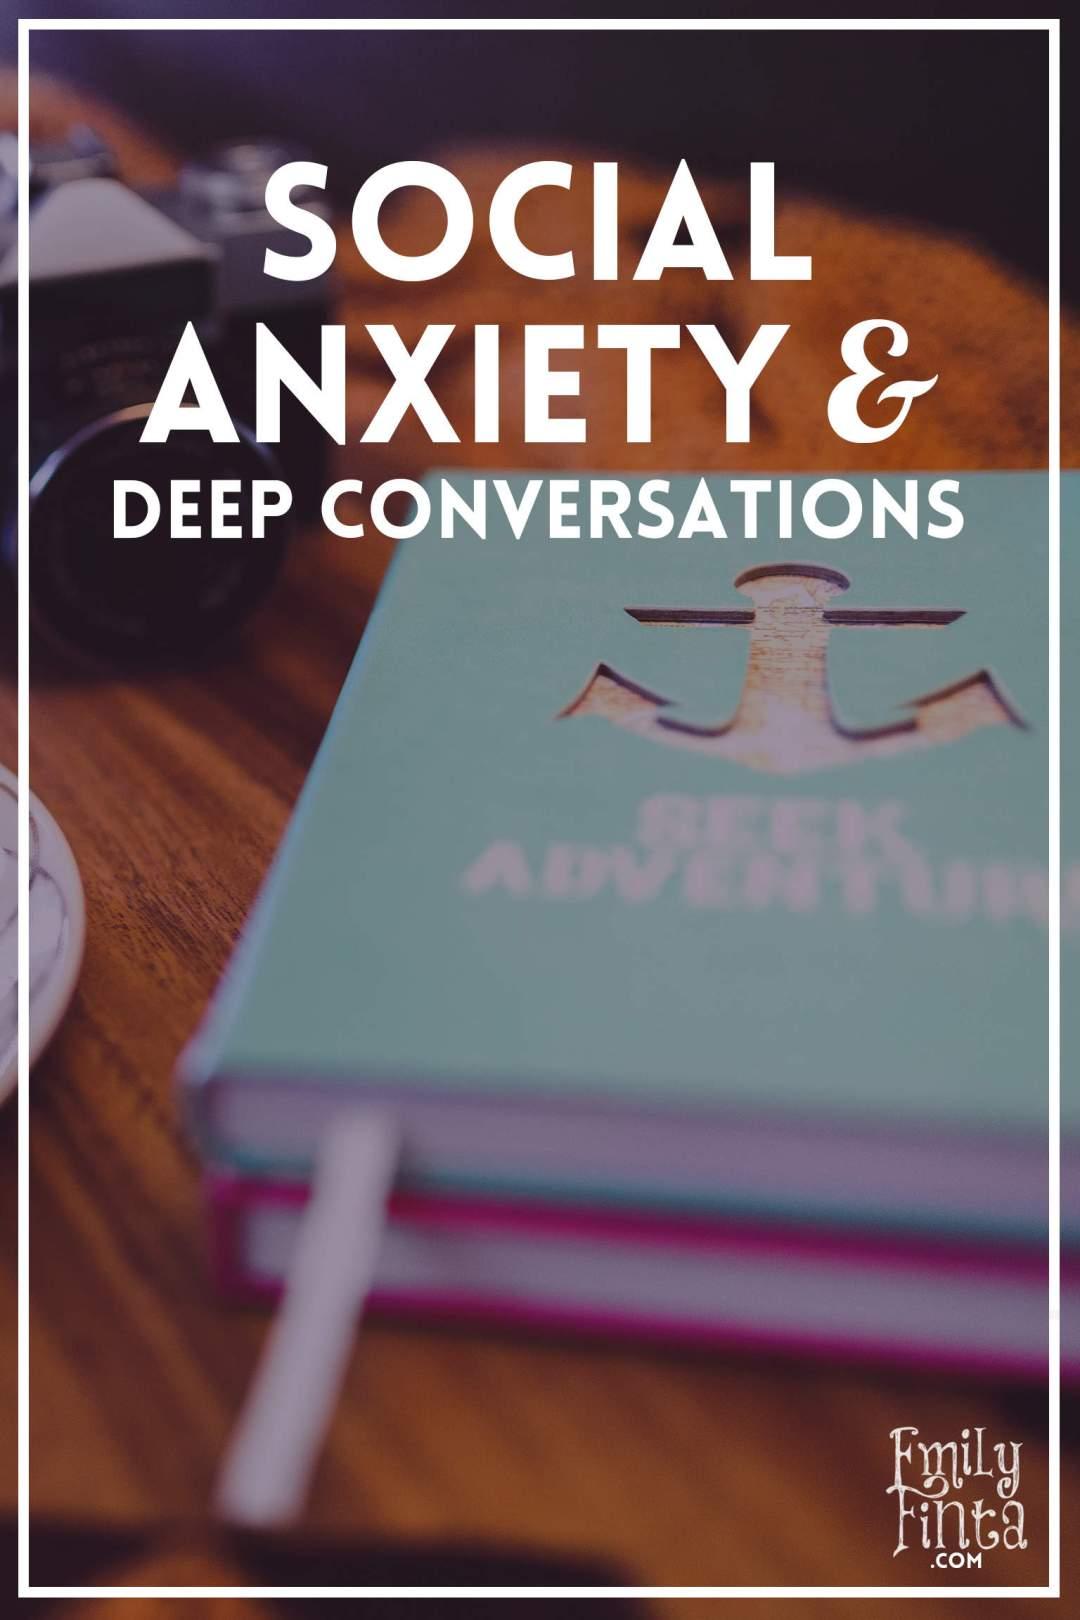 Emily Finta - Social Anxiety & Deep Conversations